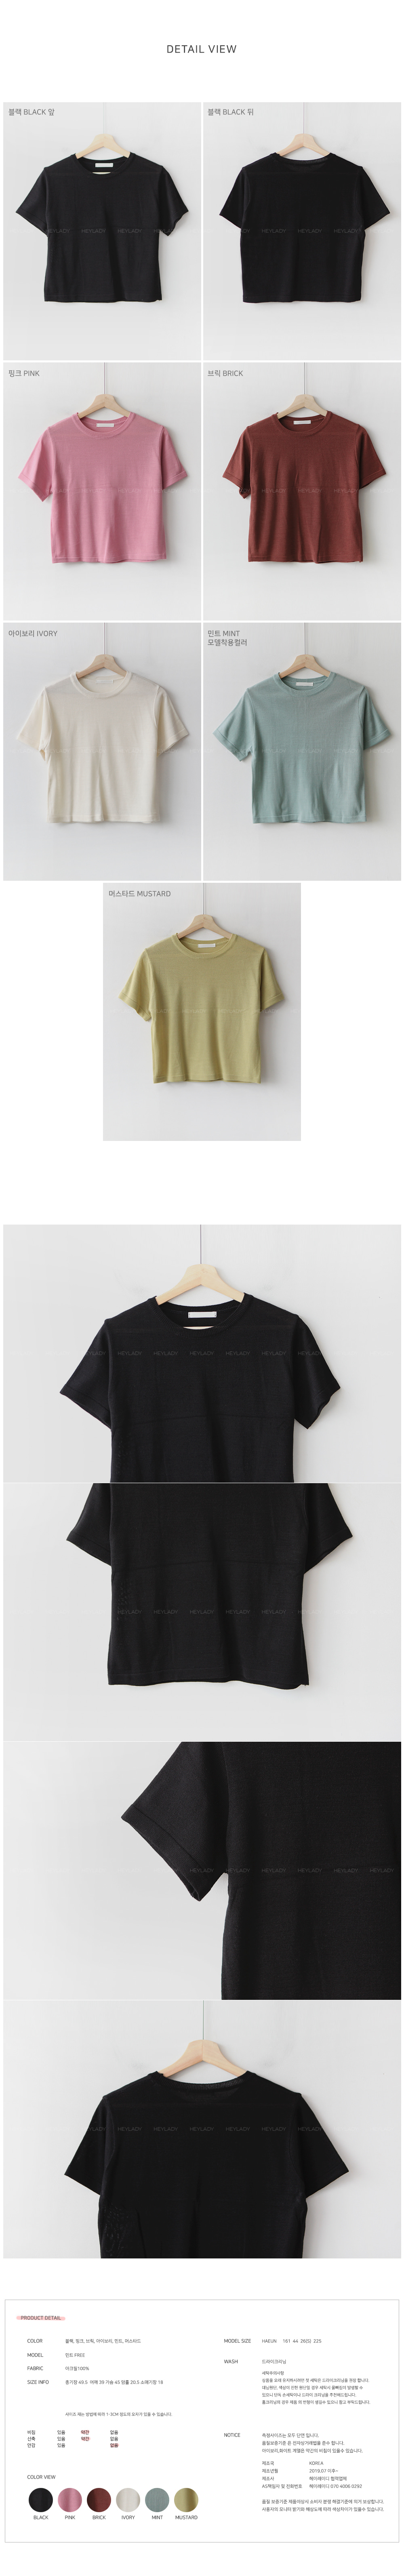 Urban Cropped Short Sleeves